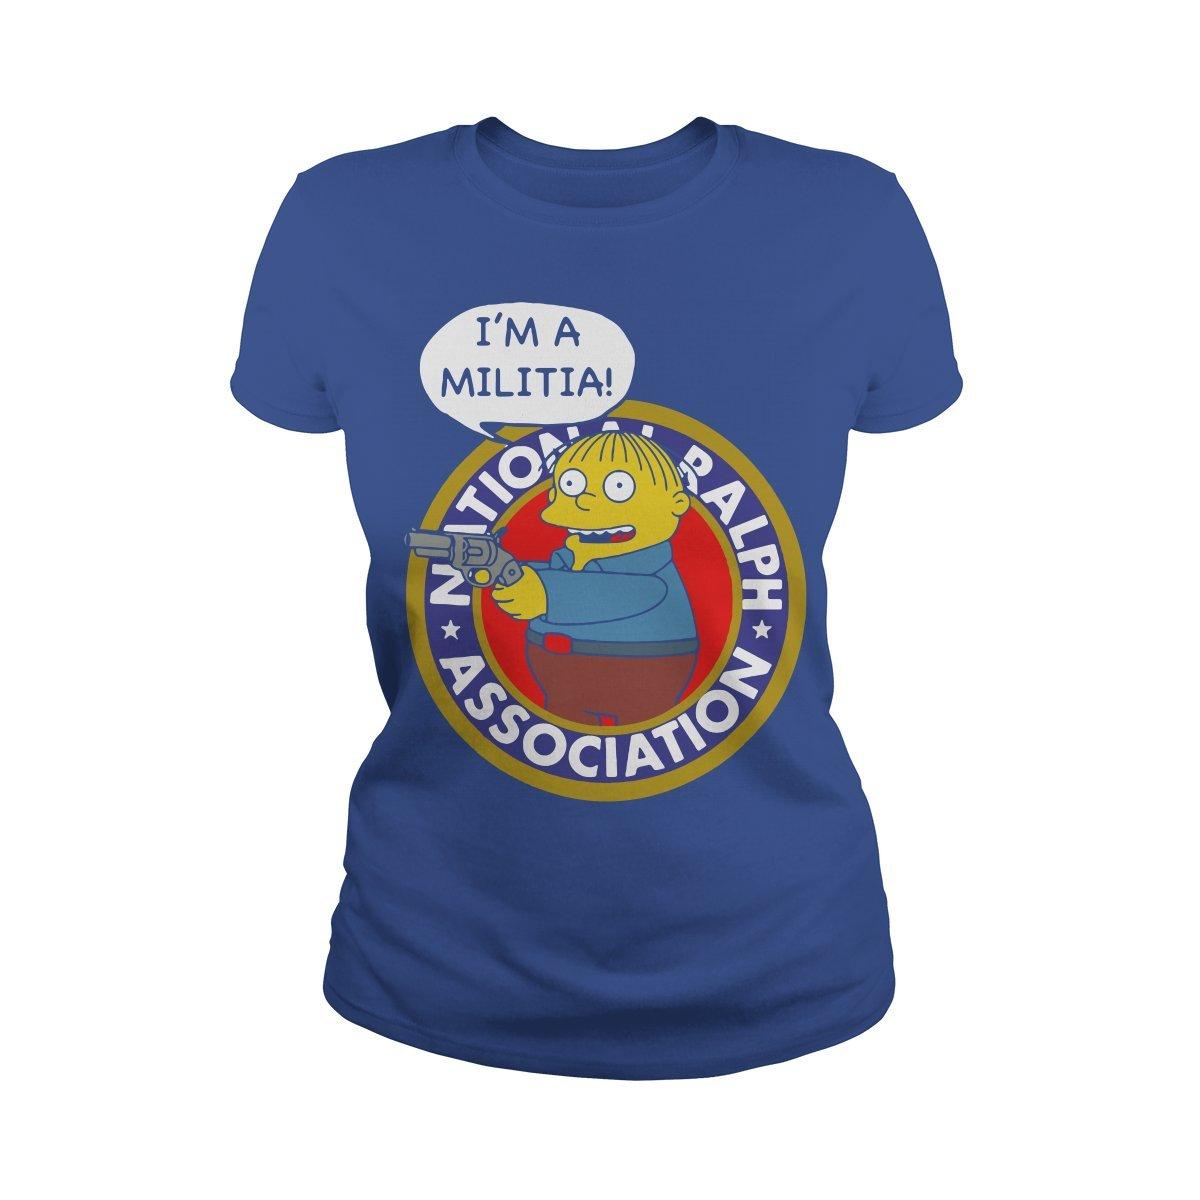 Ladies Tee Royal blueee XXLarge I'm a Militia TShirt